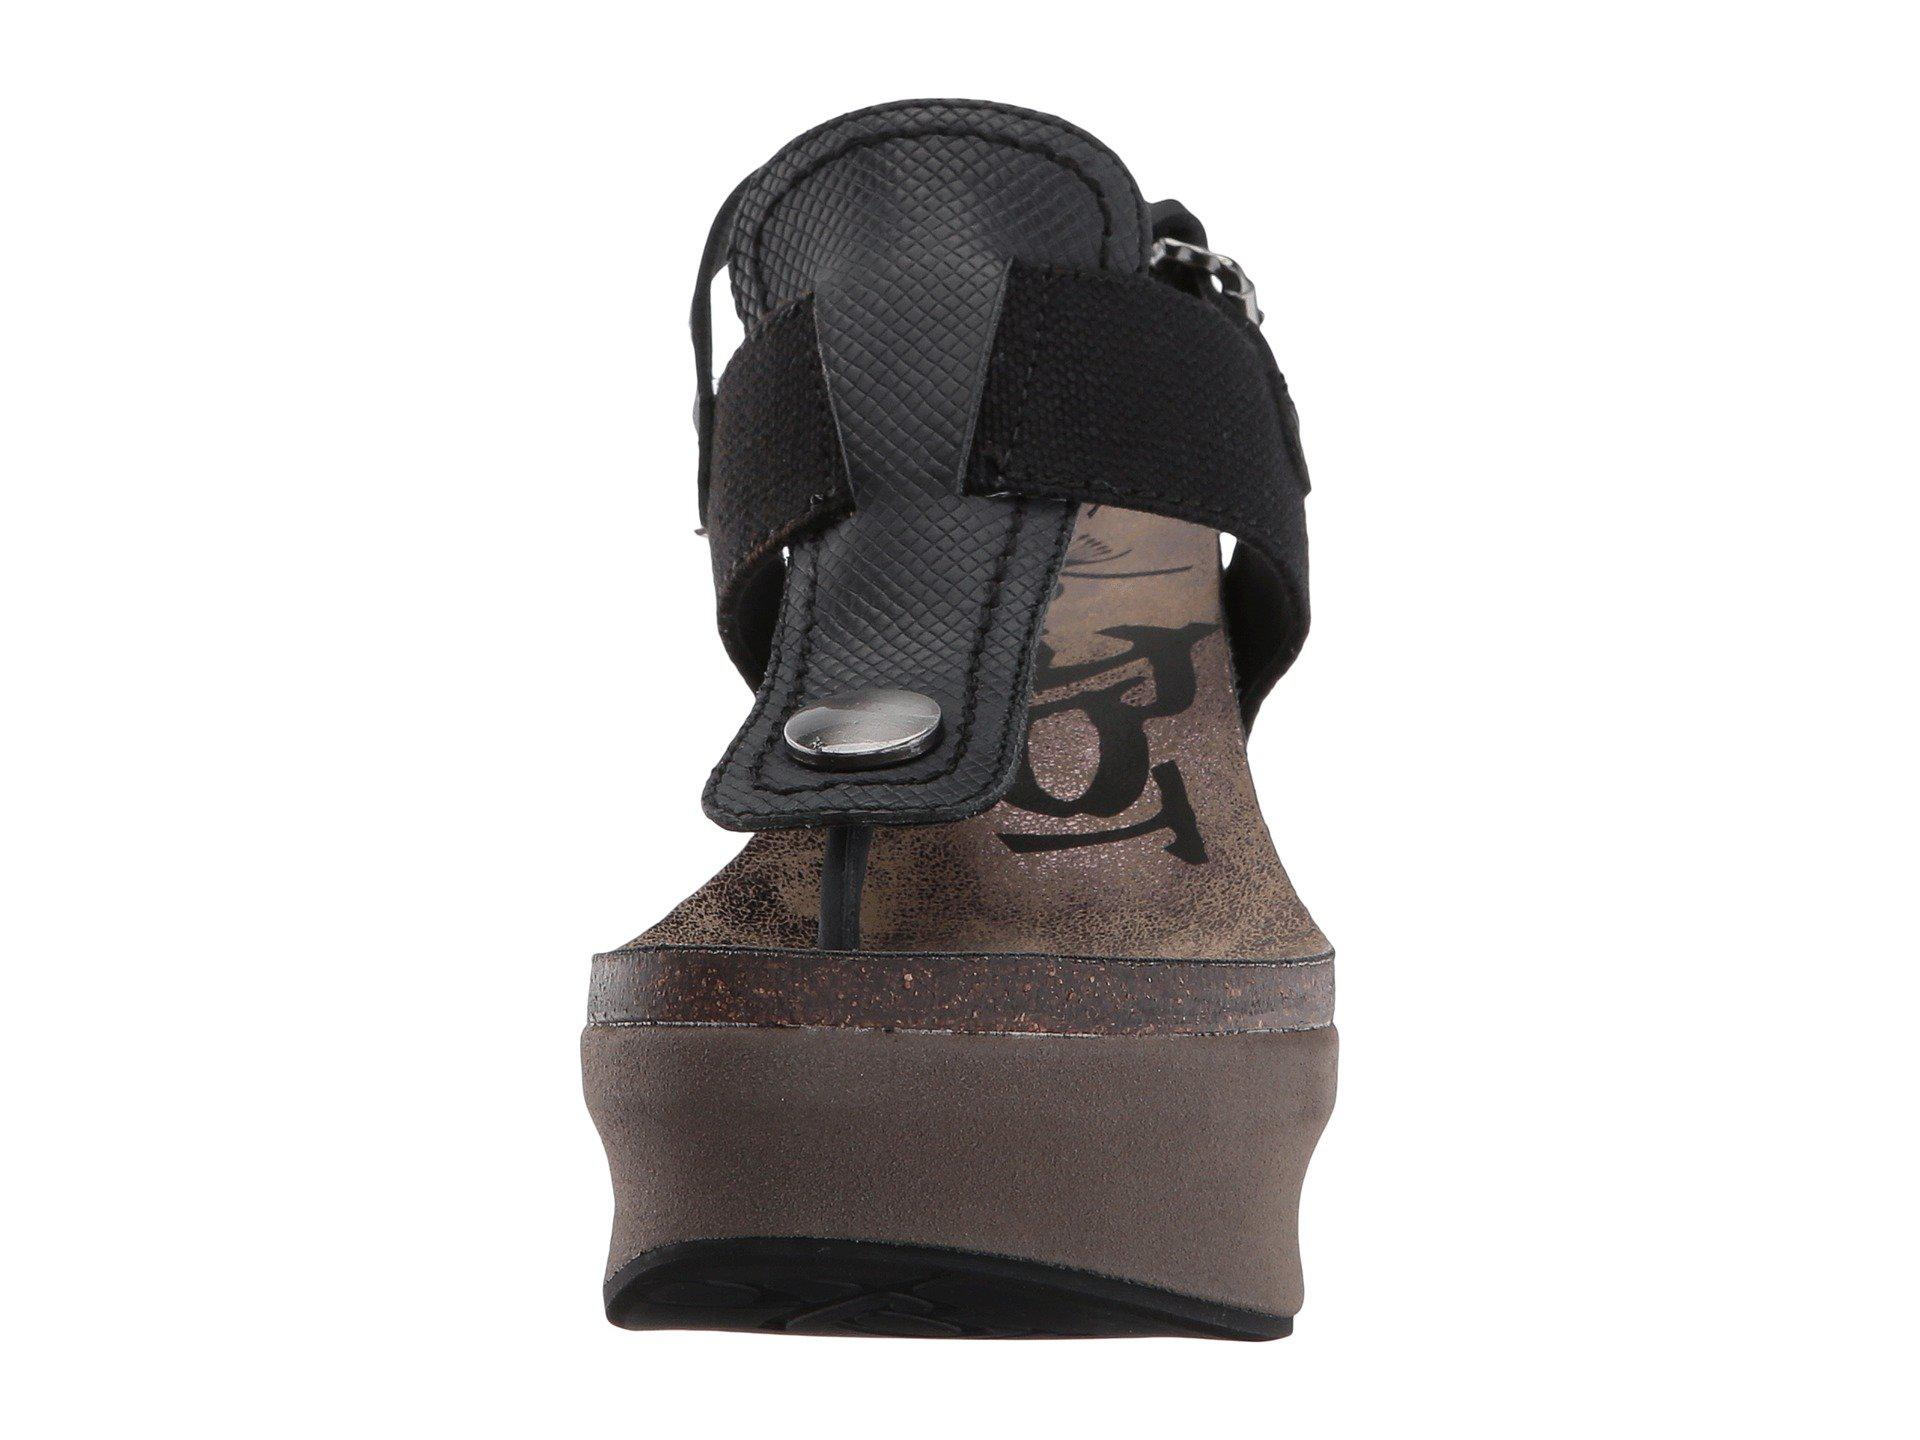 b0f47bfe9c8 Otbt - Black Joyride (copper) Women s Wedge Shoes - Lyst. View fullscreen